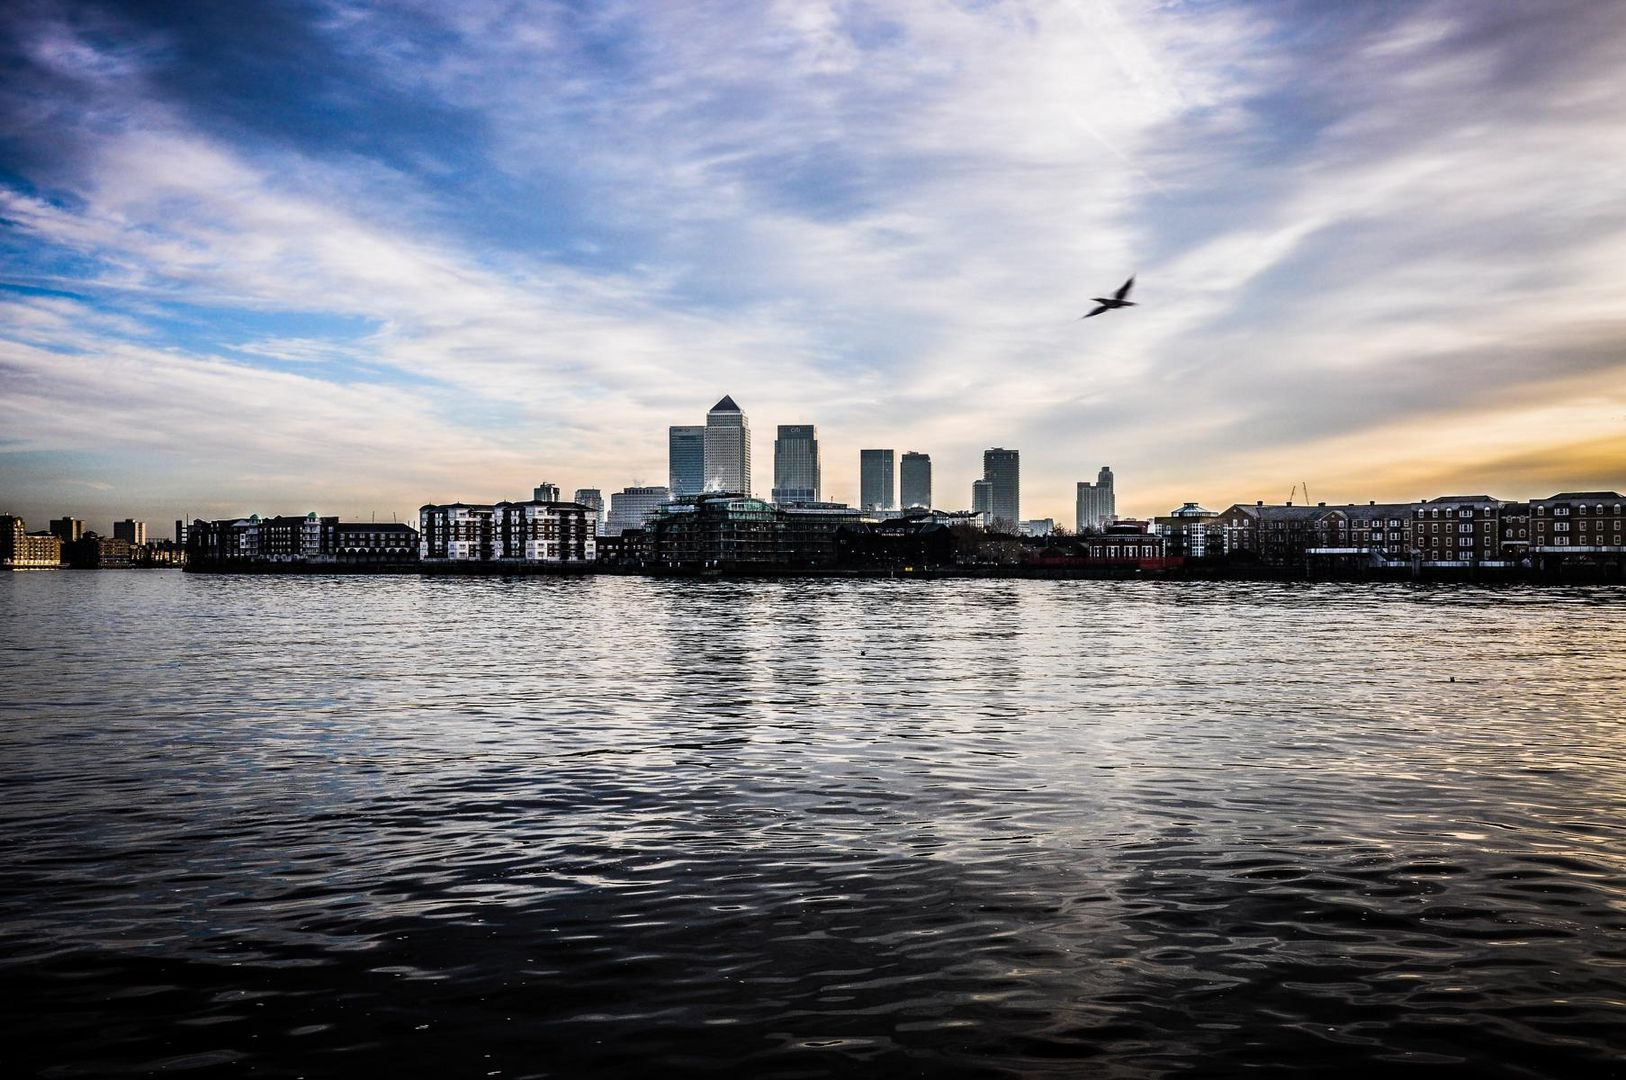 London Docklands im Morgengrauen